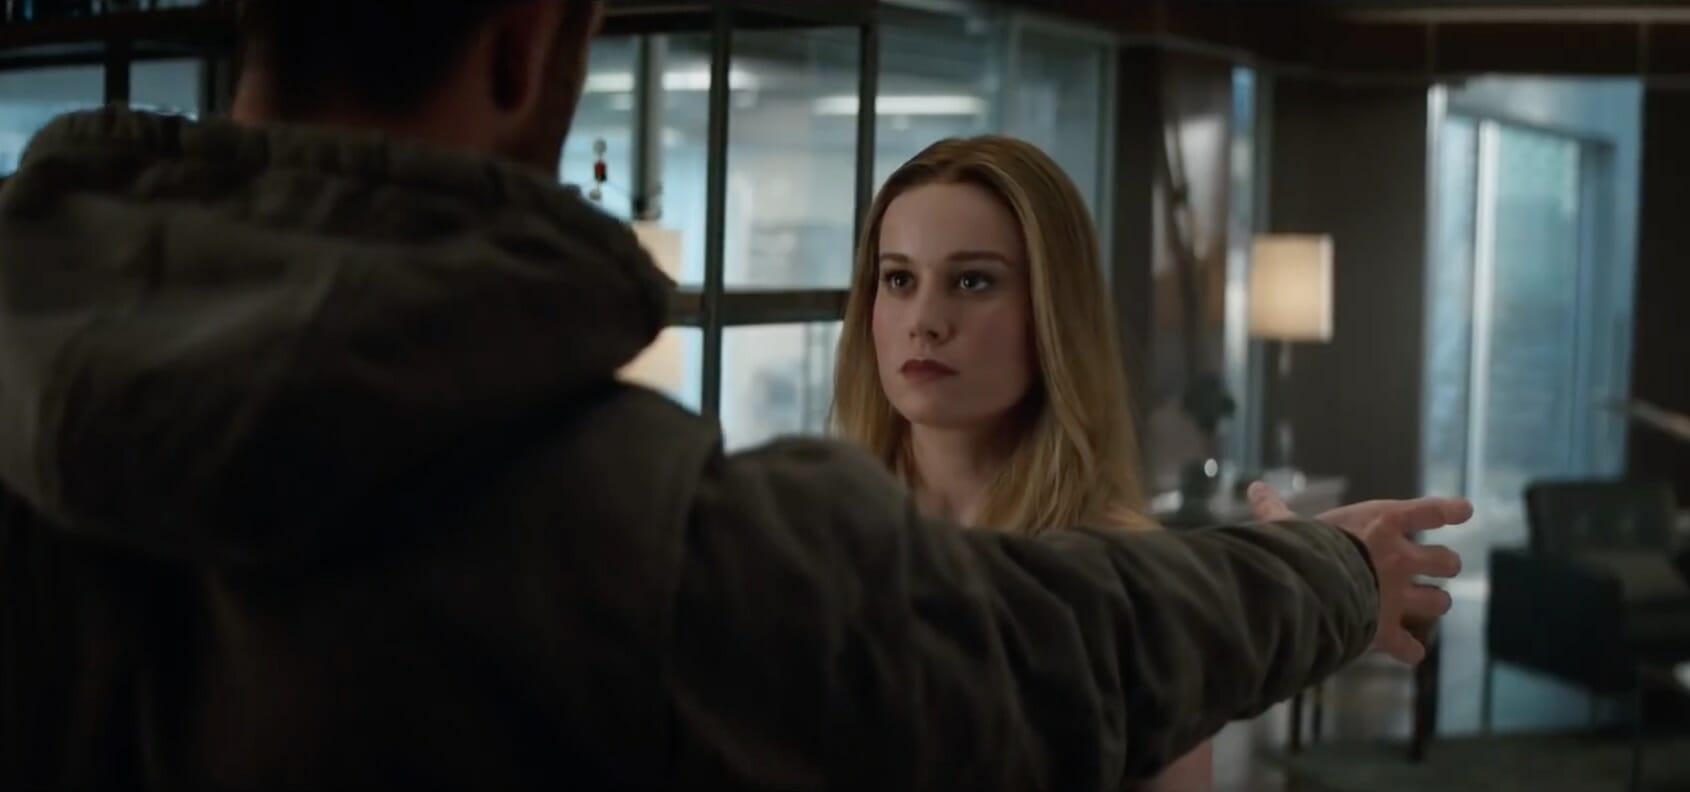 Avengers: Endgame revela emocionante clip promocional en GMA